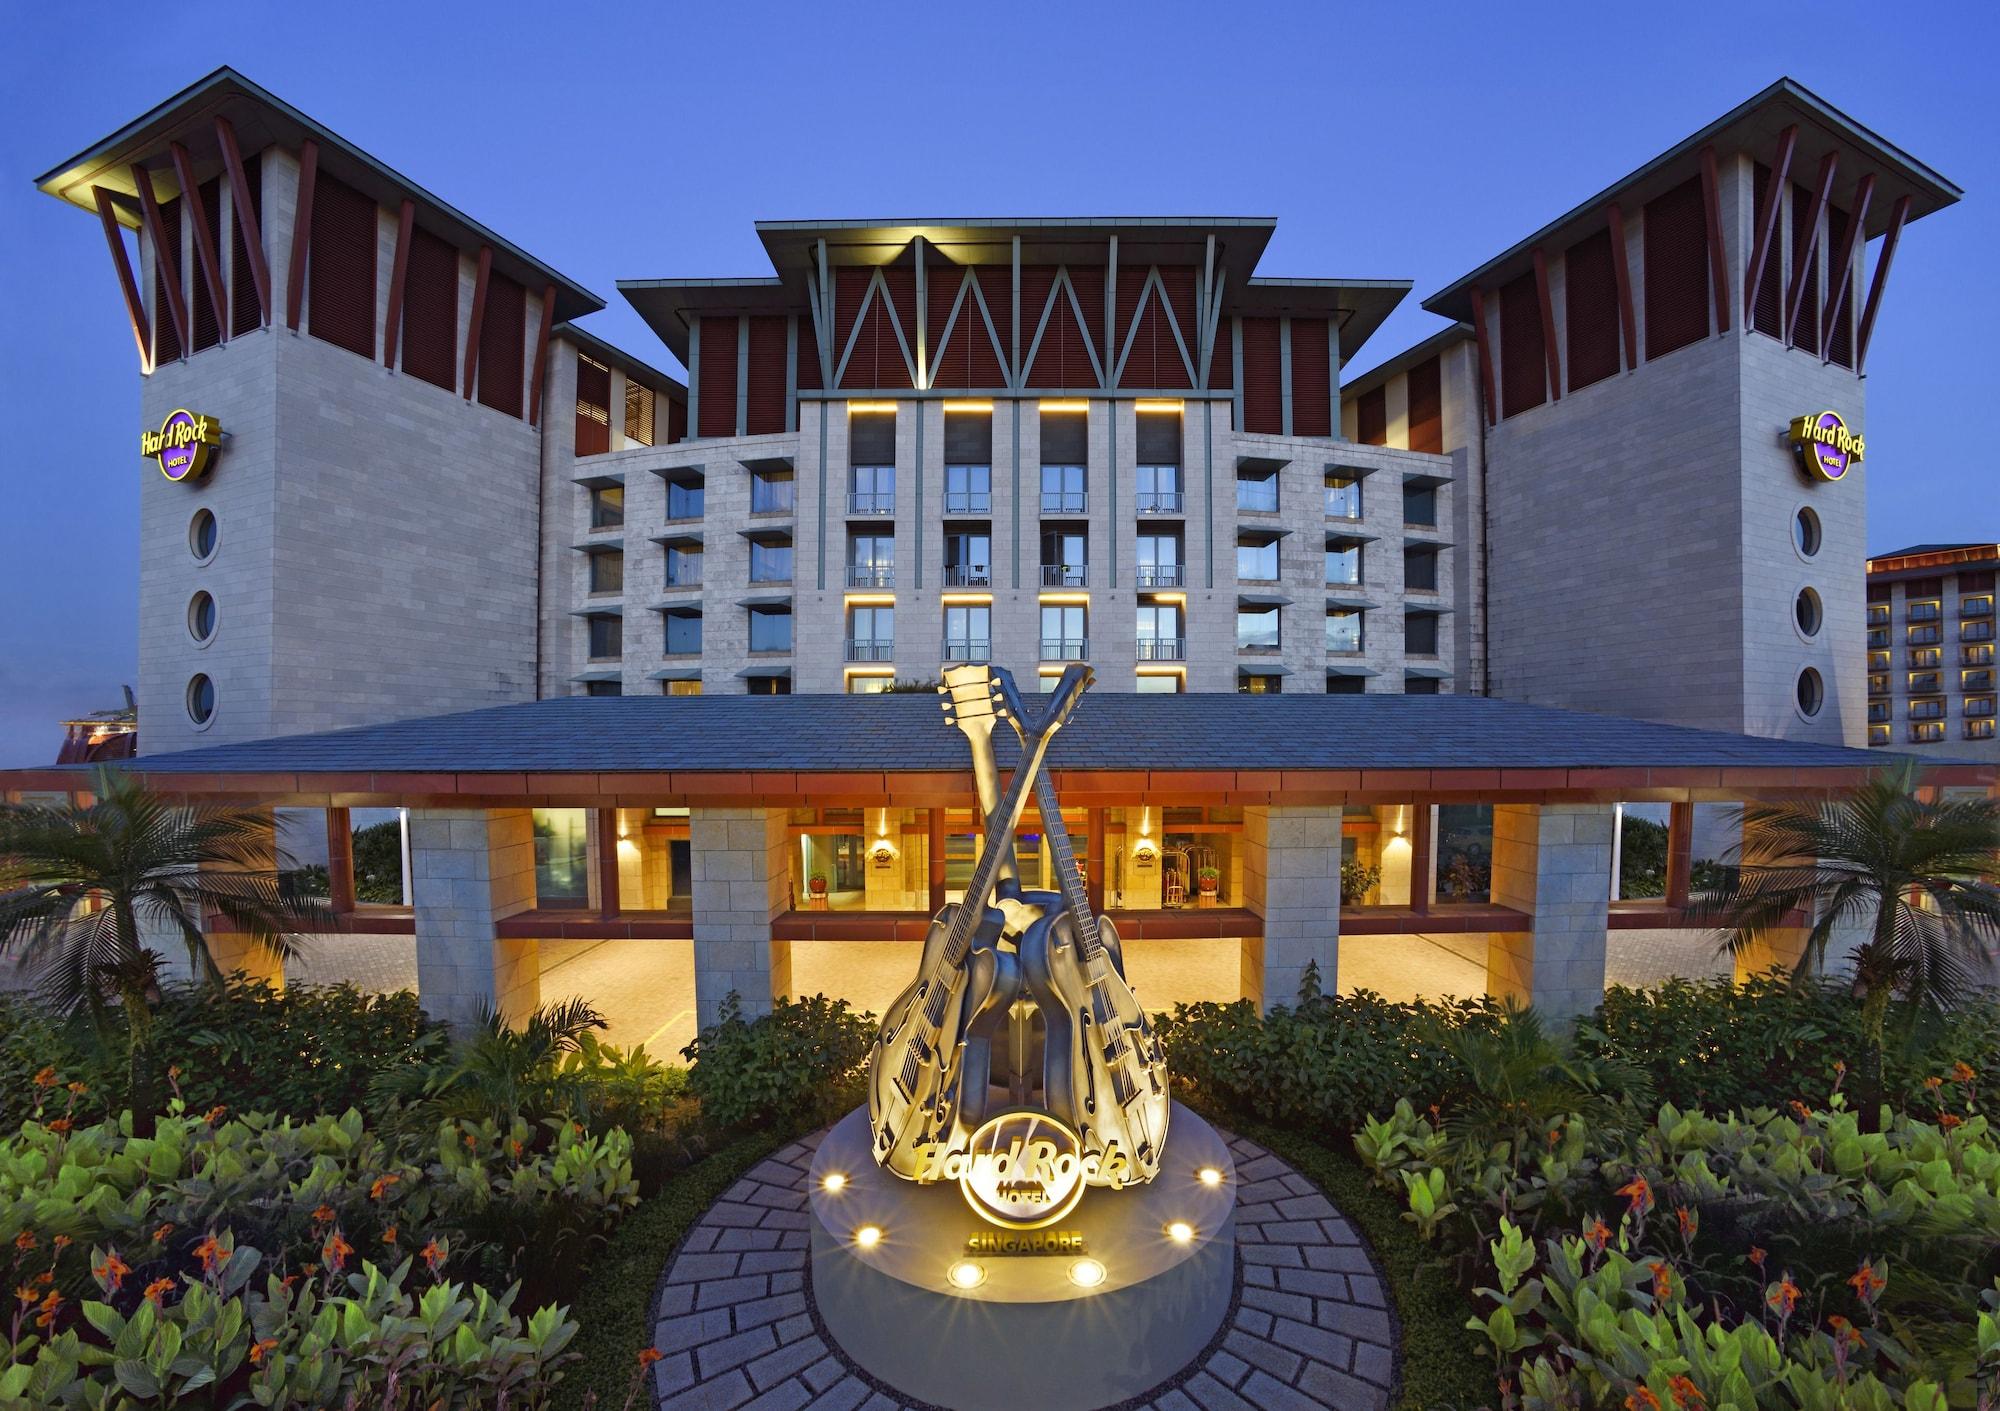 Resort World Sentosa - Hard Rock Hotel, Pulau Sentosa